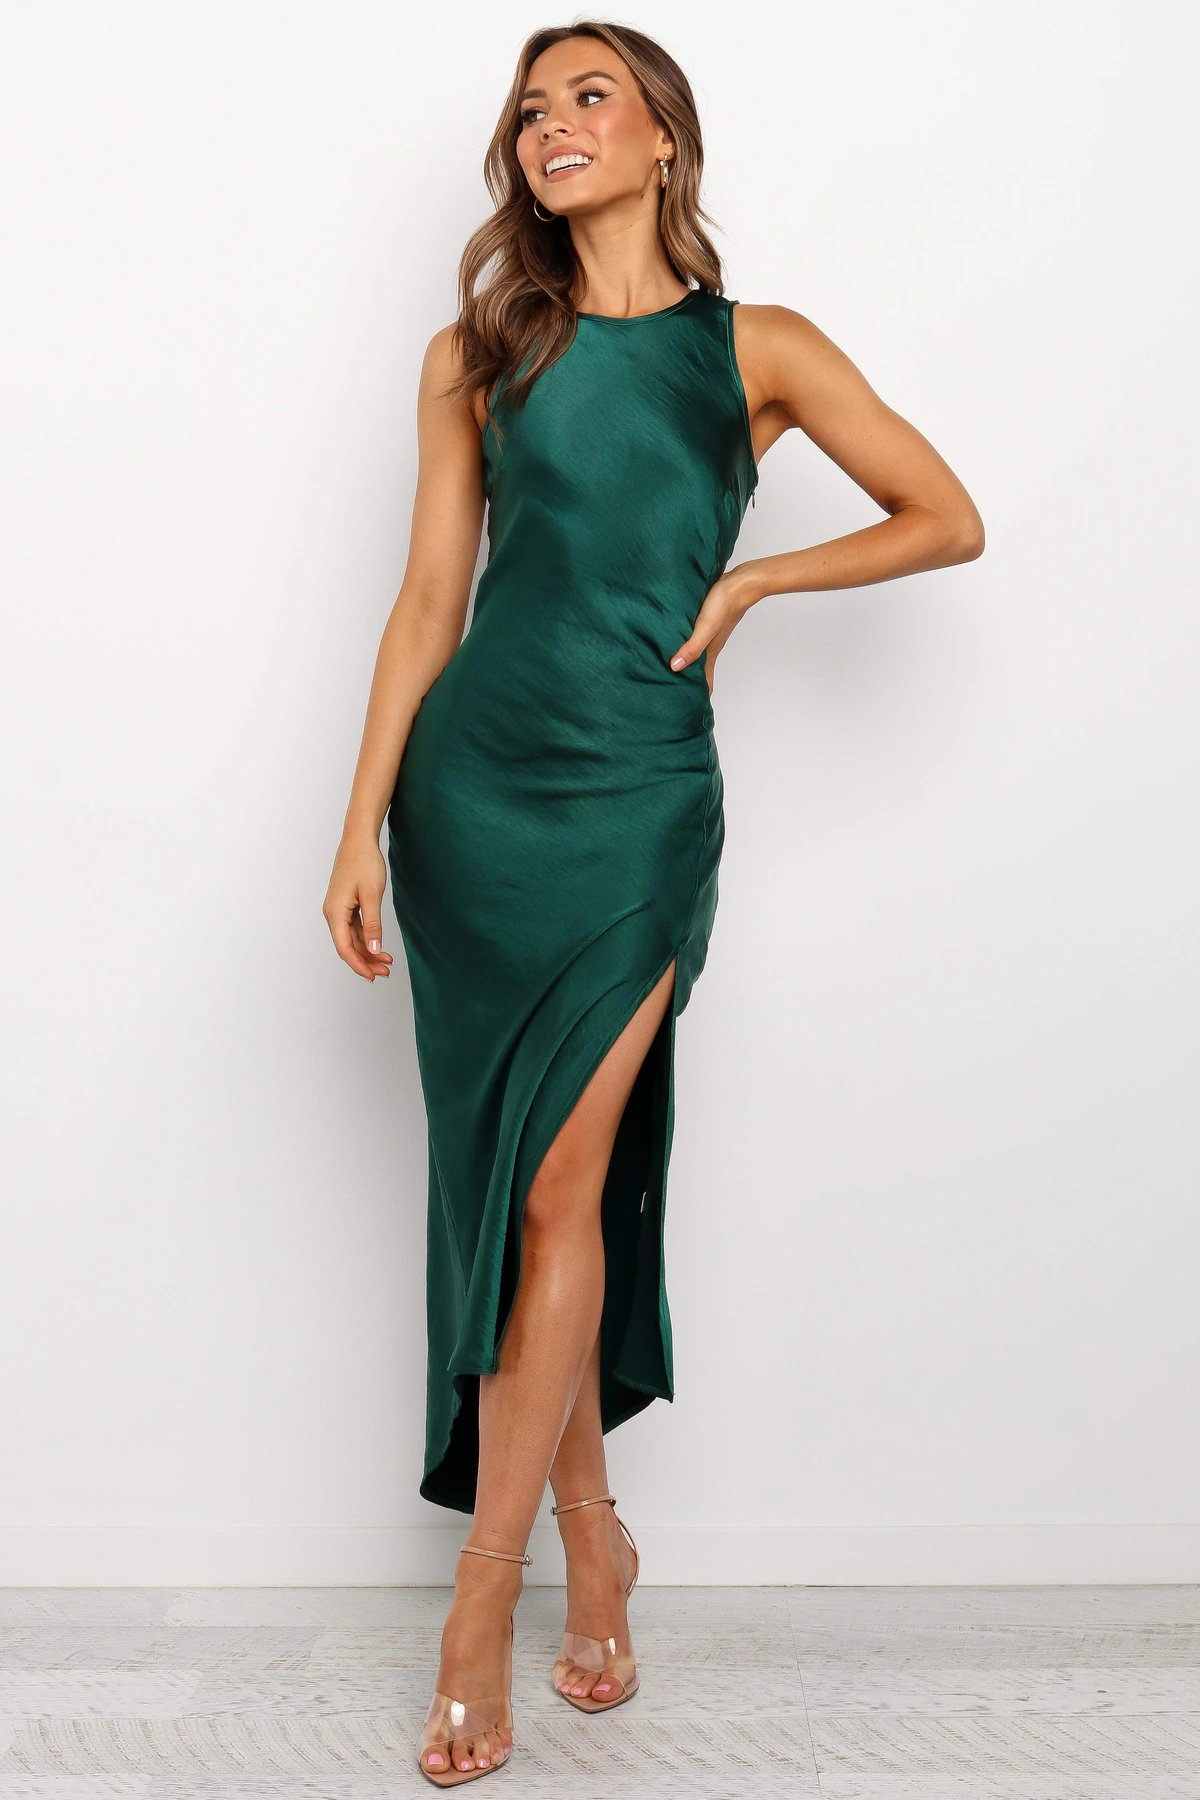 Womens Satin Silk Sleeveless Slip Dress Ladies V Neck Party Cocktail Midi Dress